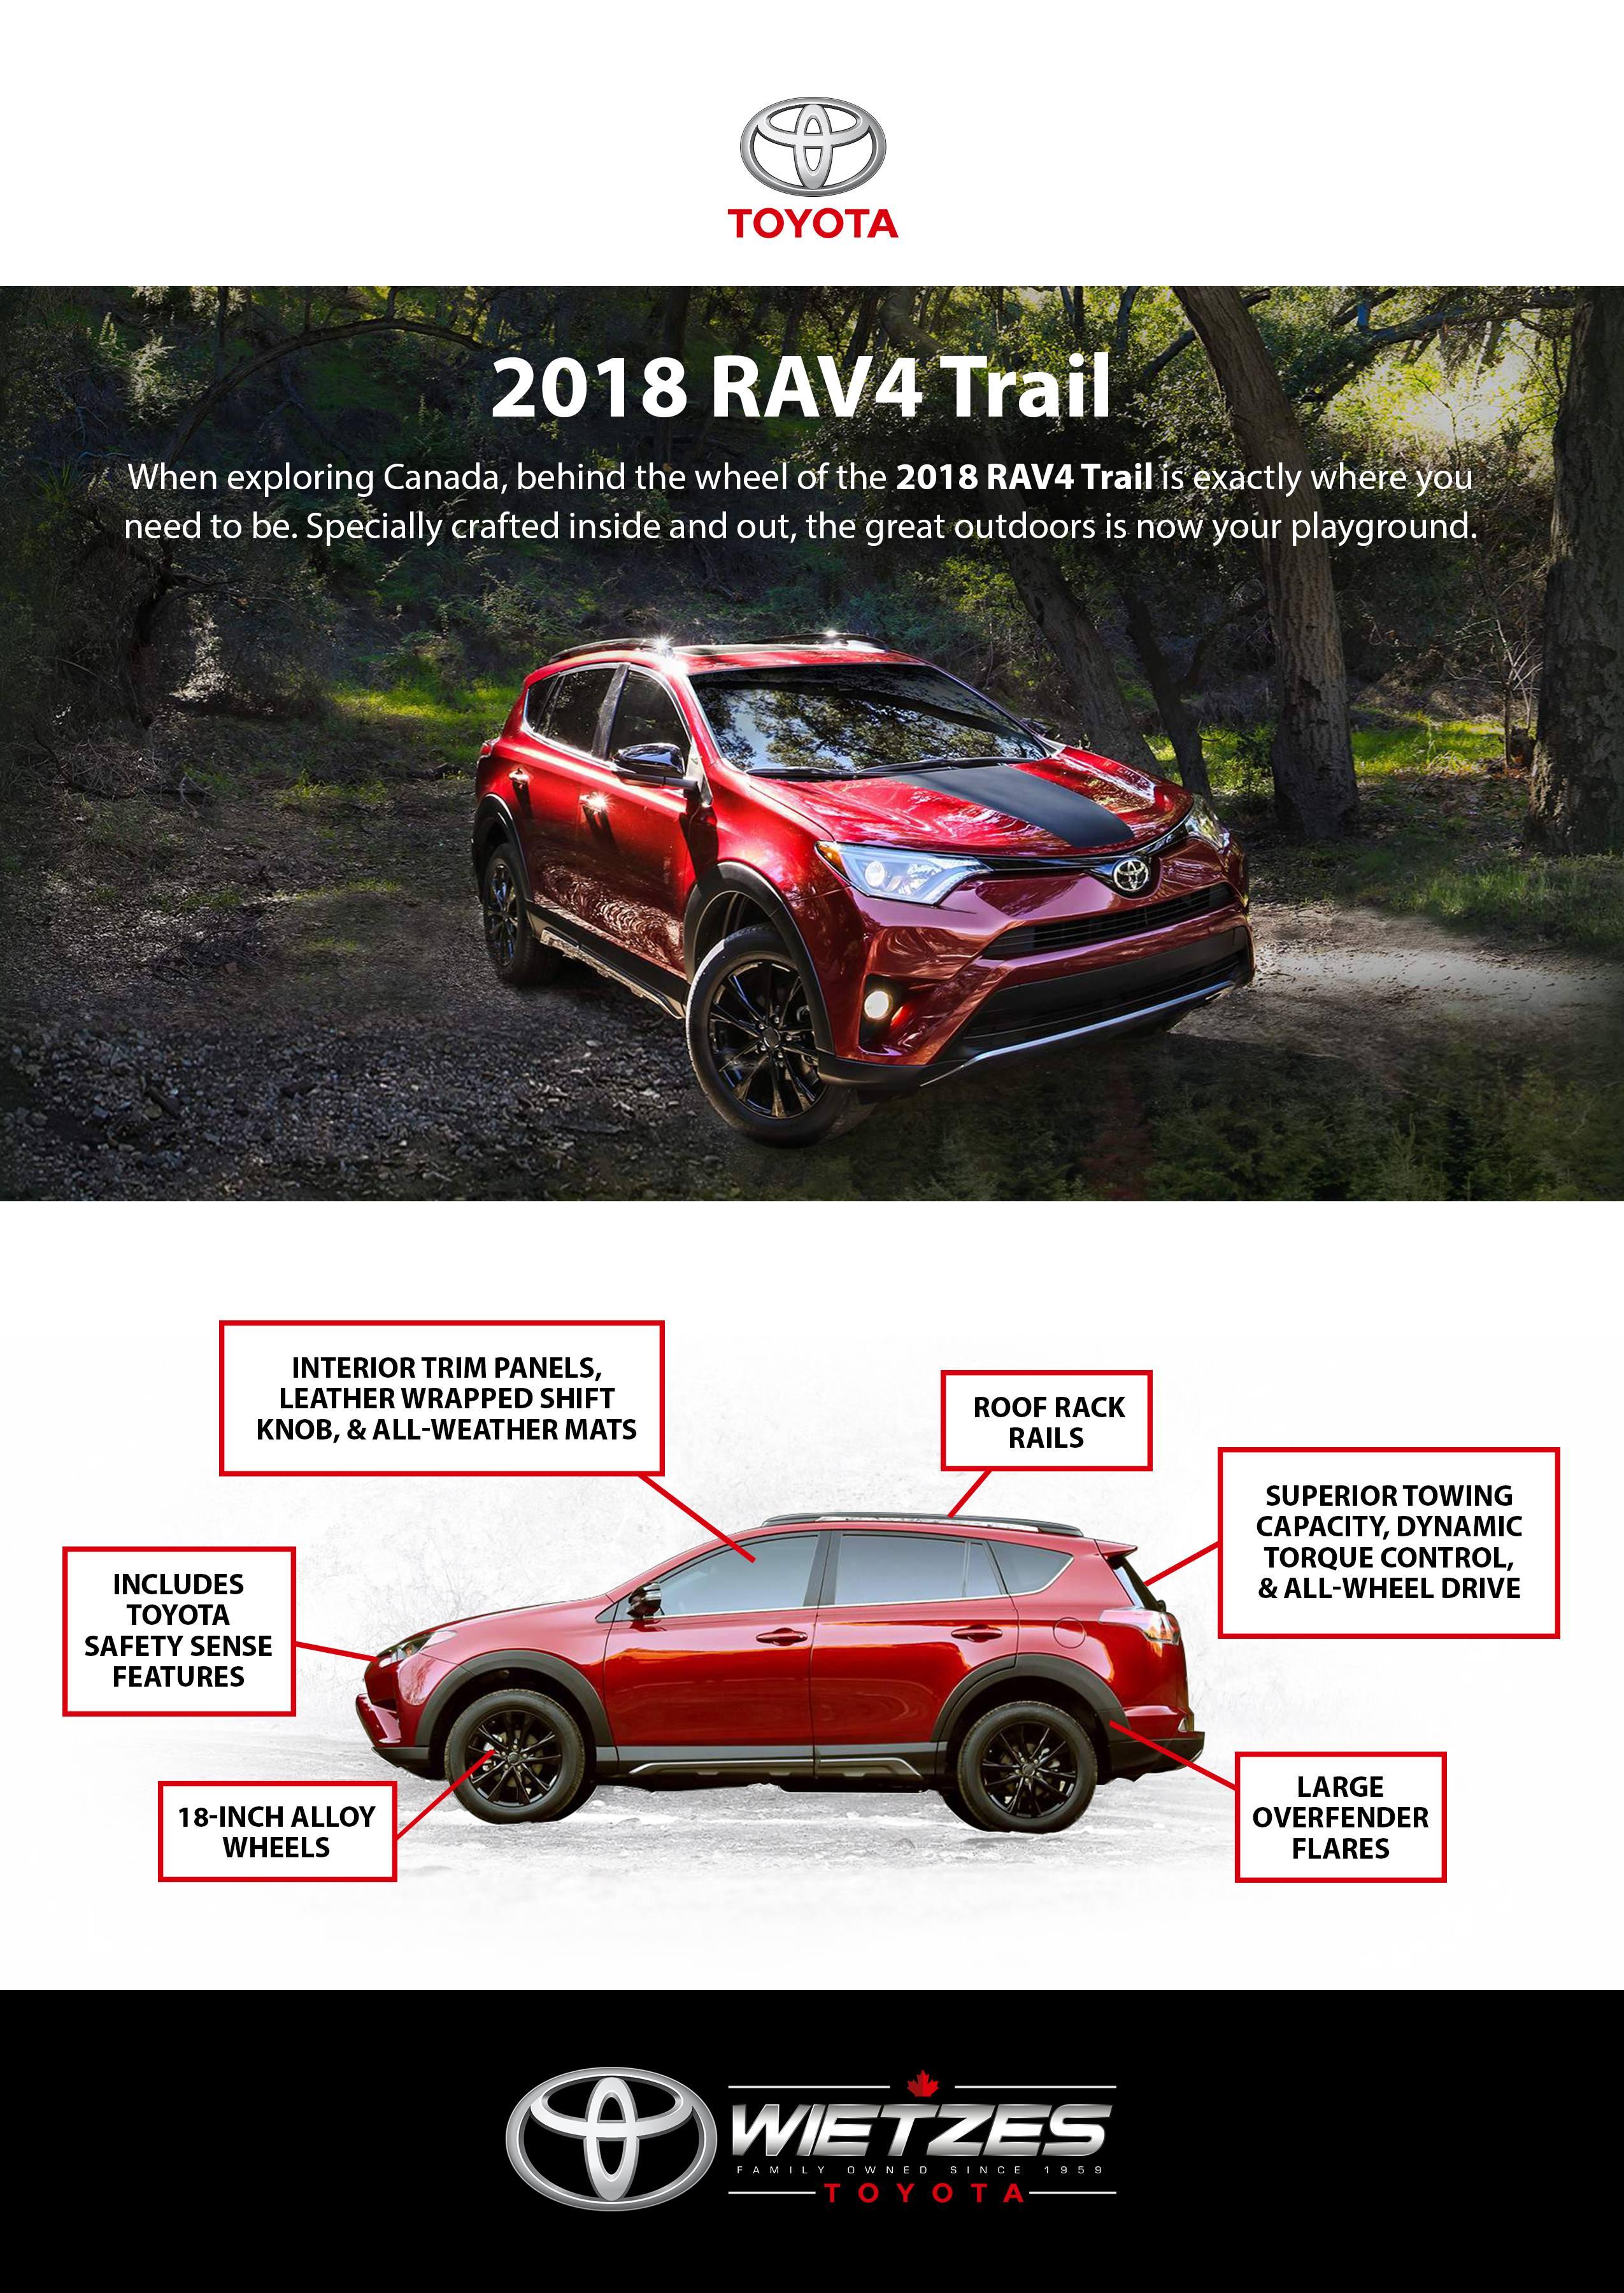 WietzesToyota-Rav4Trail-Poster